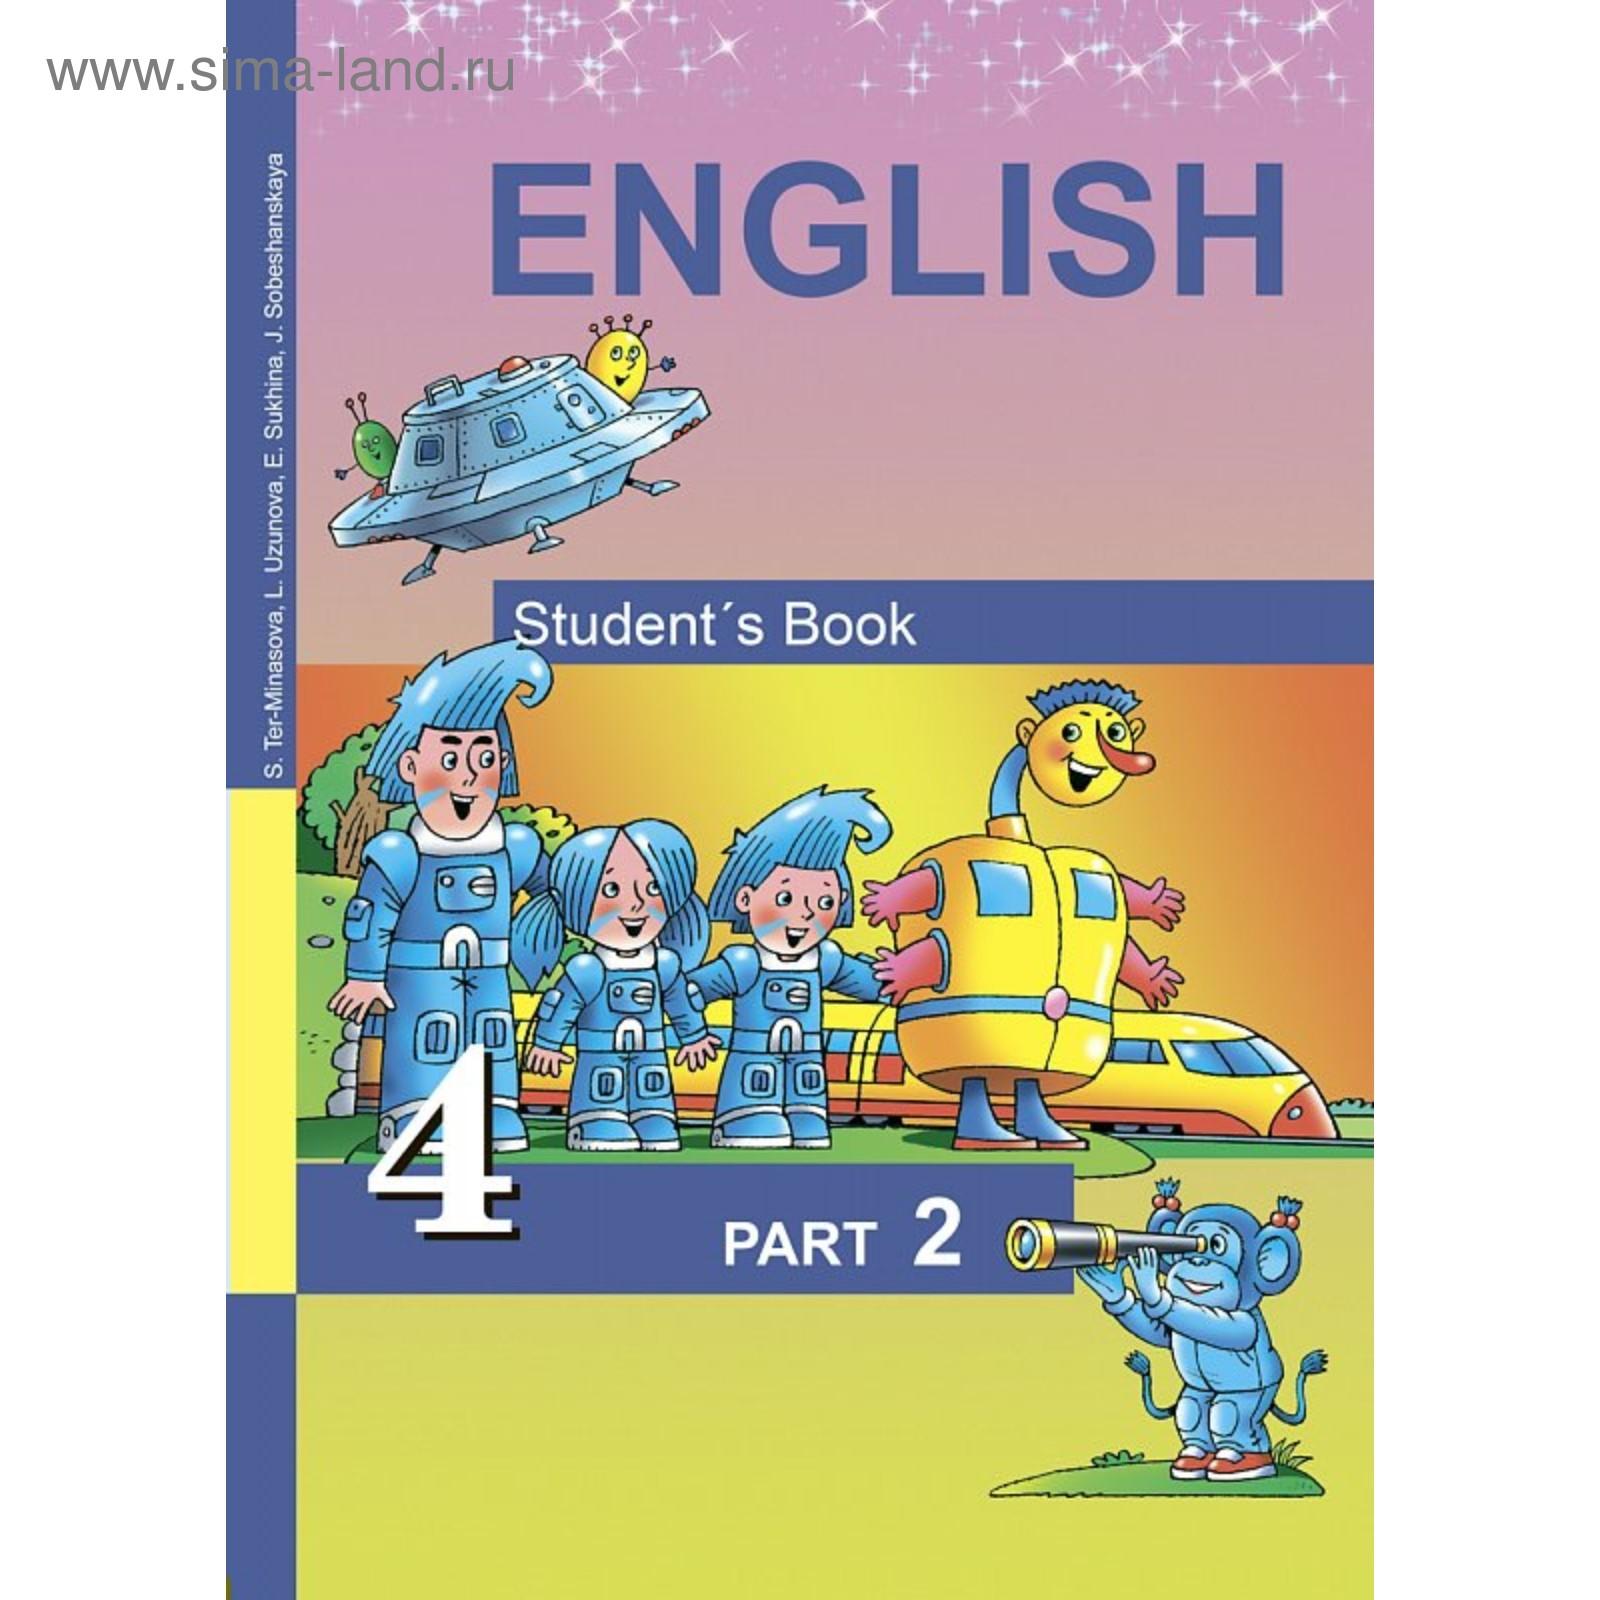 английский тер минасова 4 класс тетрадь